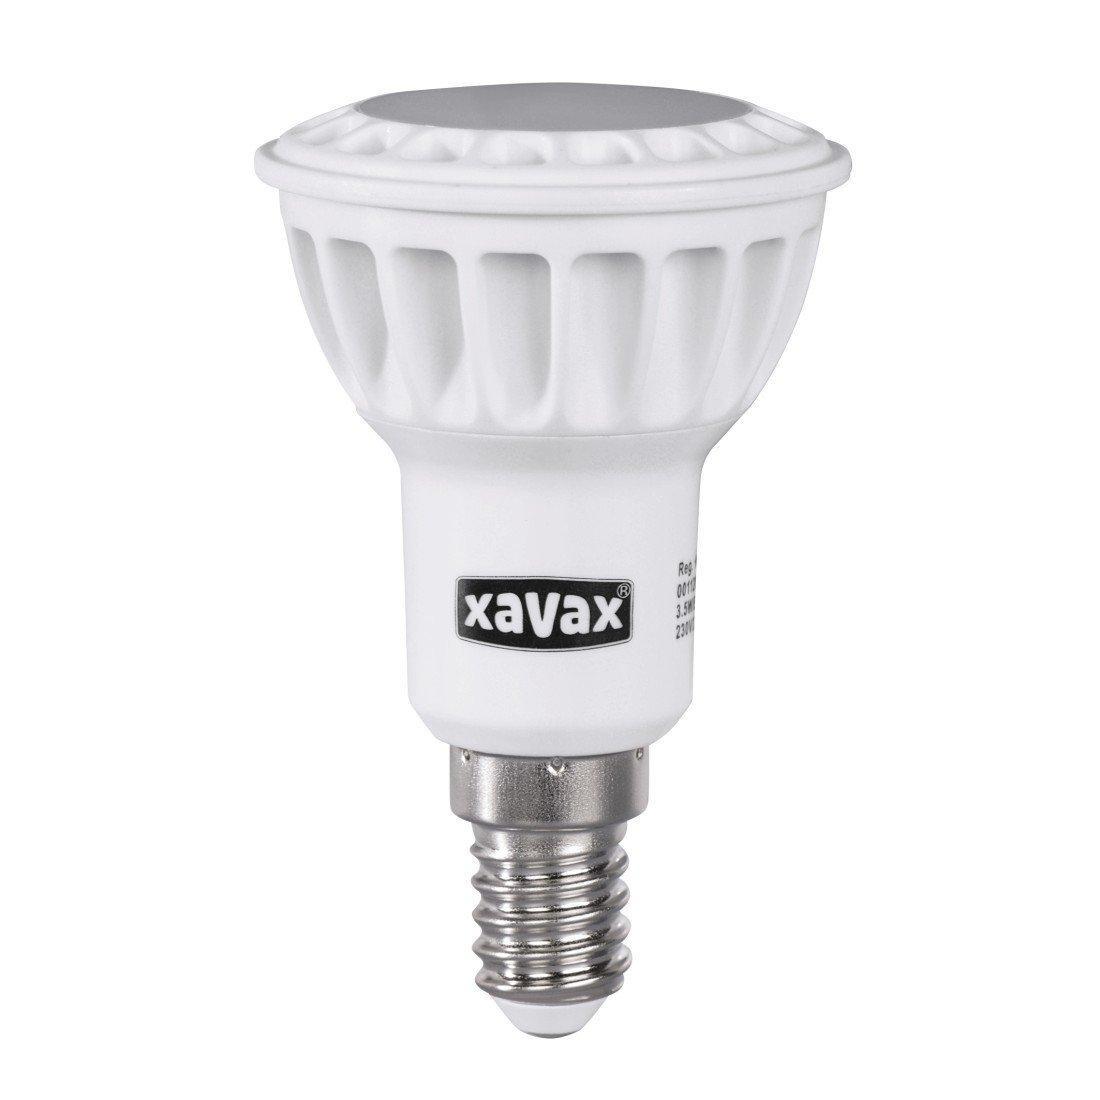 Xavax LED-Lampe E14, 3.5 W (ersetzt 25W), 200 lm, Reflektorlampe ...